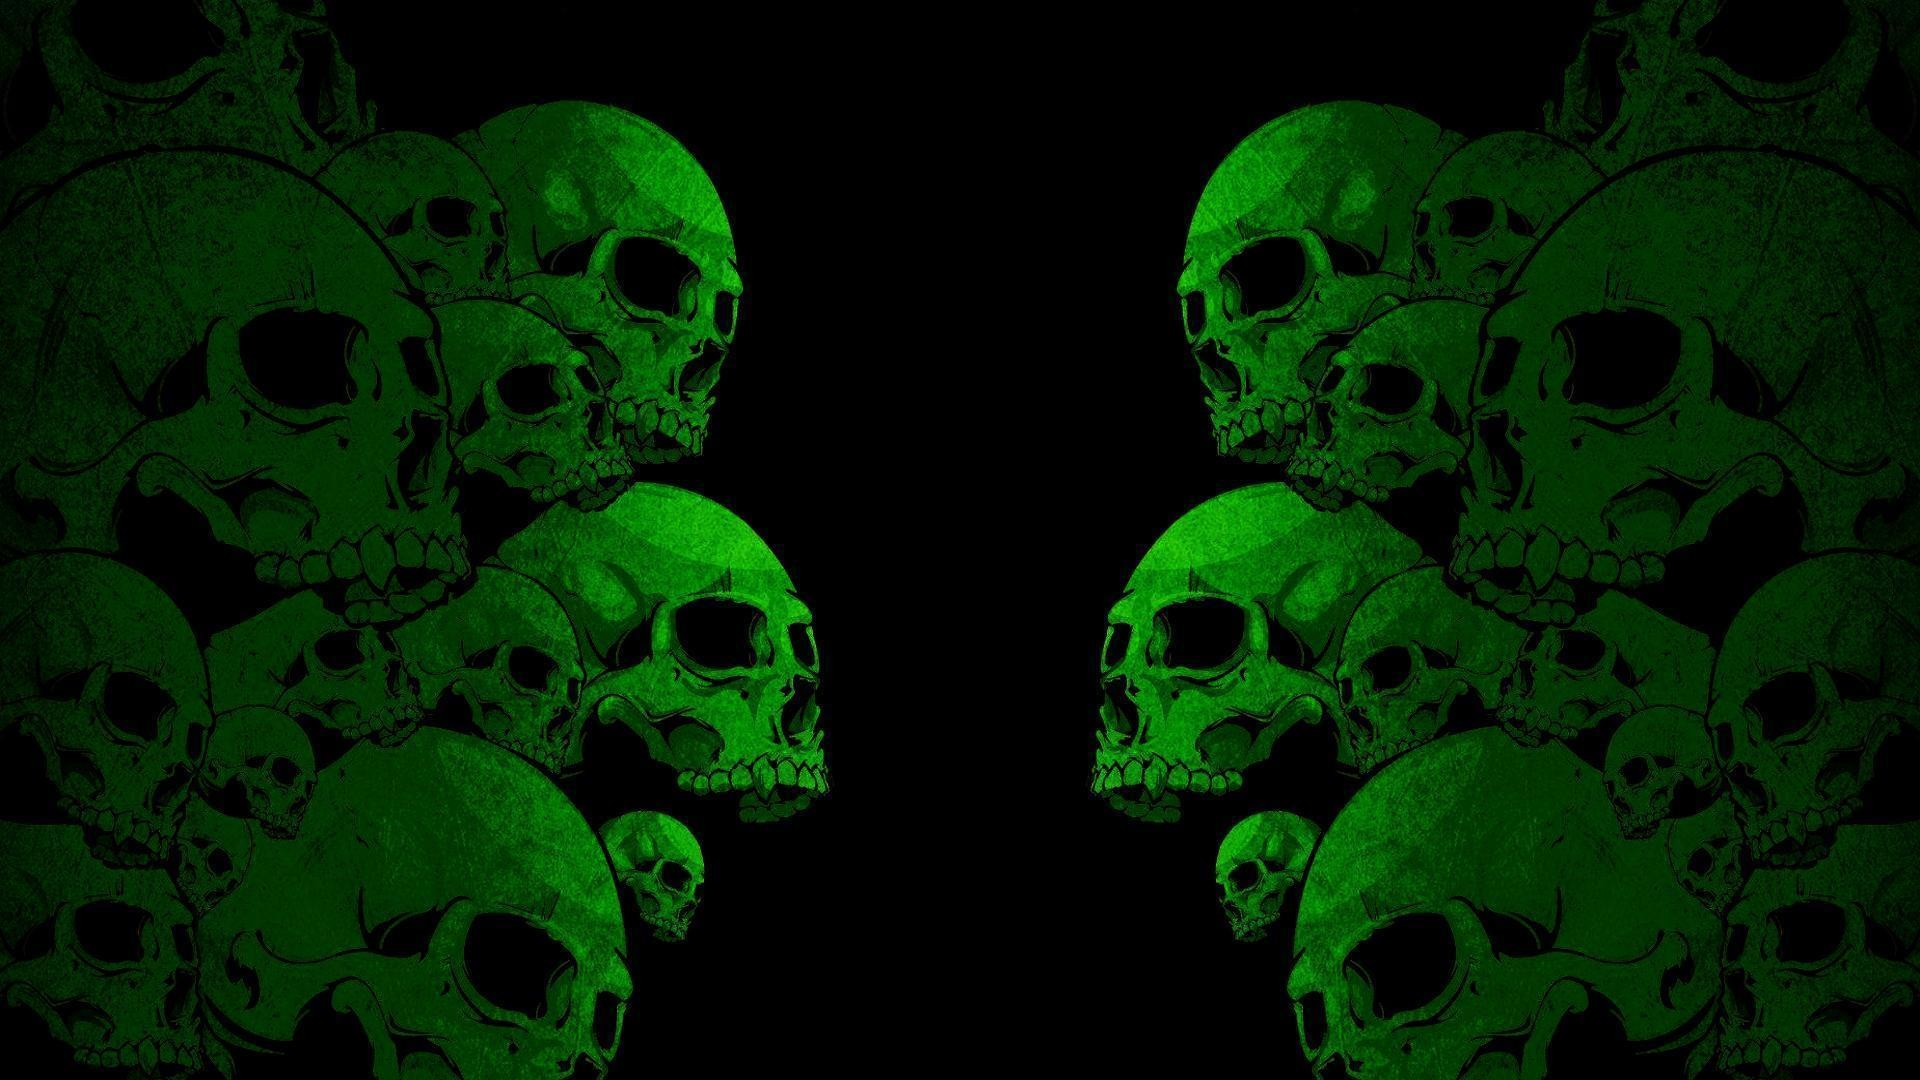 Green Skull Wallpaper 53 Images